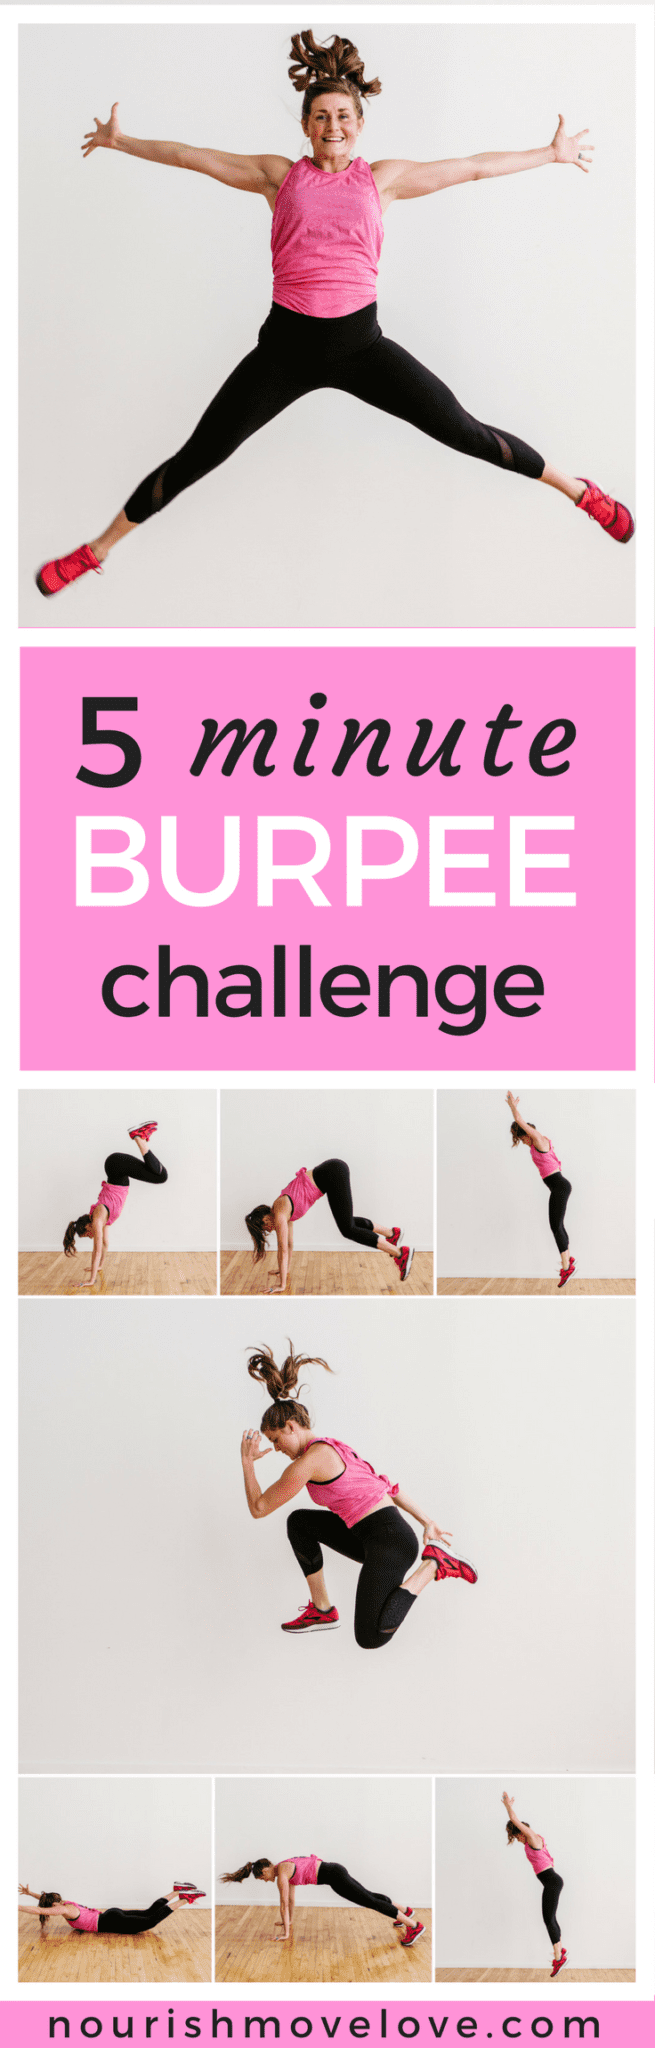 5 Minute Burpee Challenge   www.nourishmovelove.com